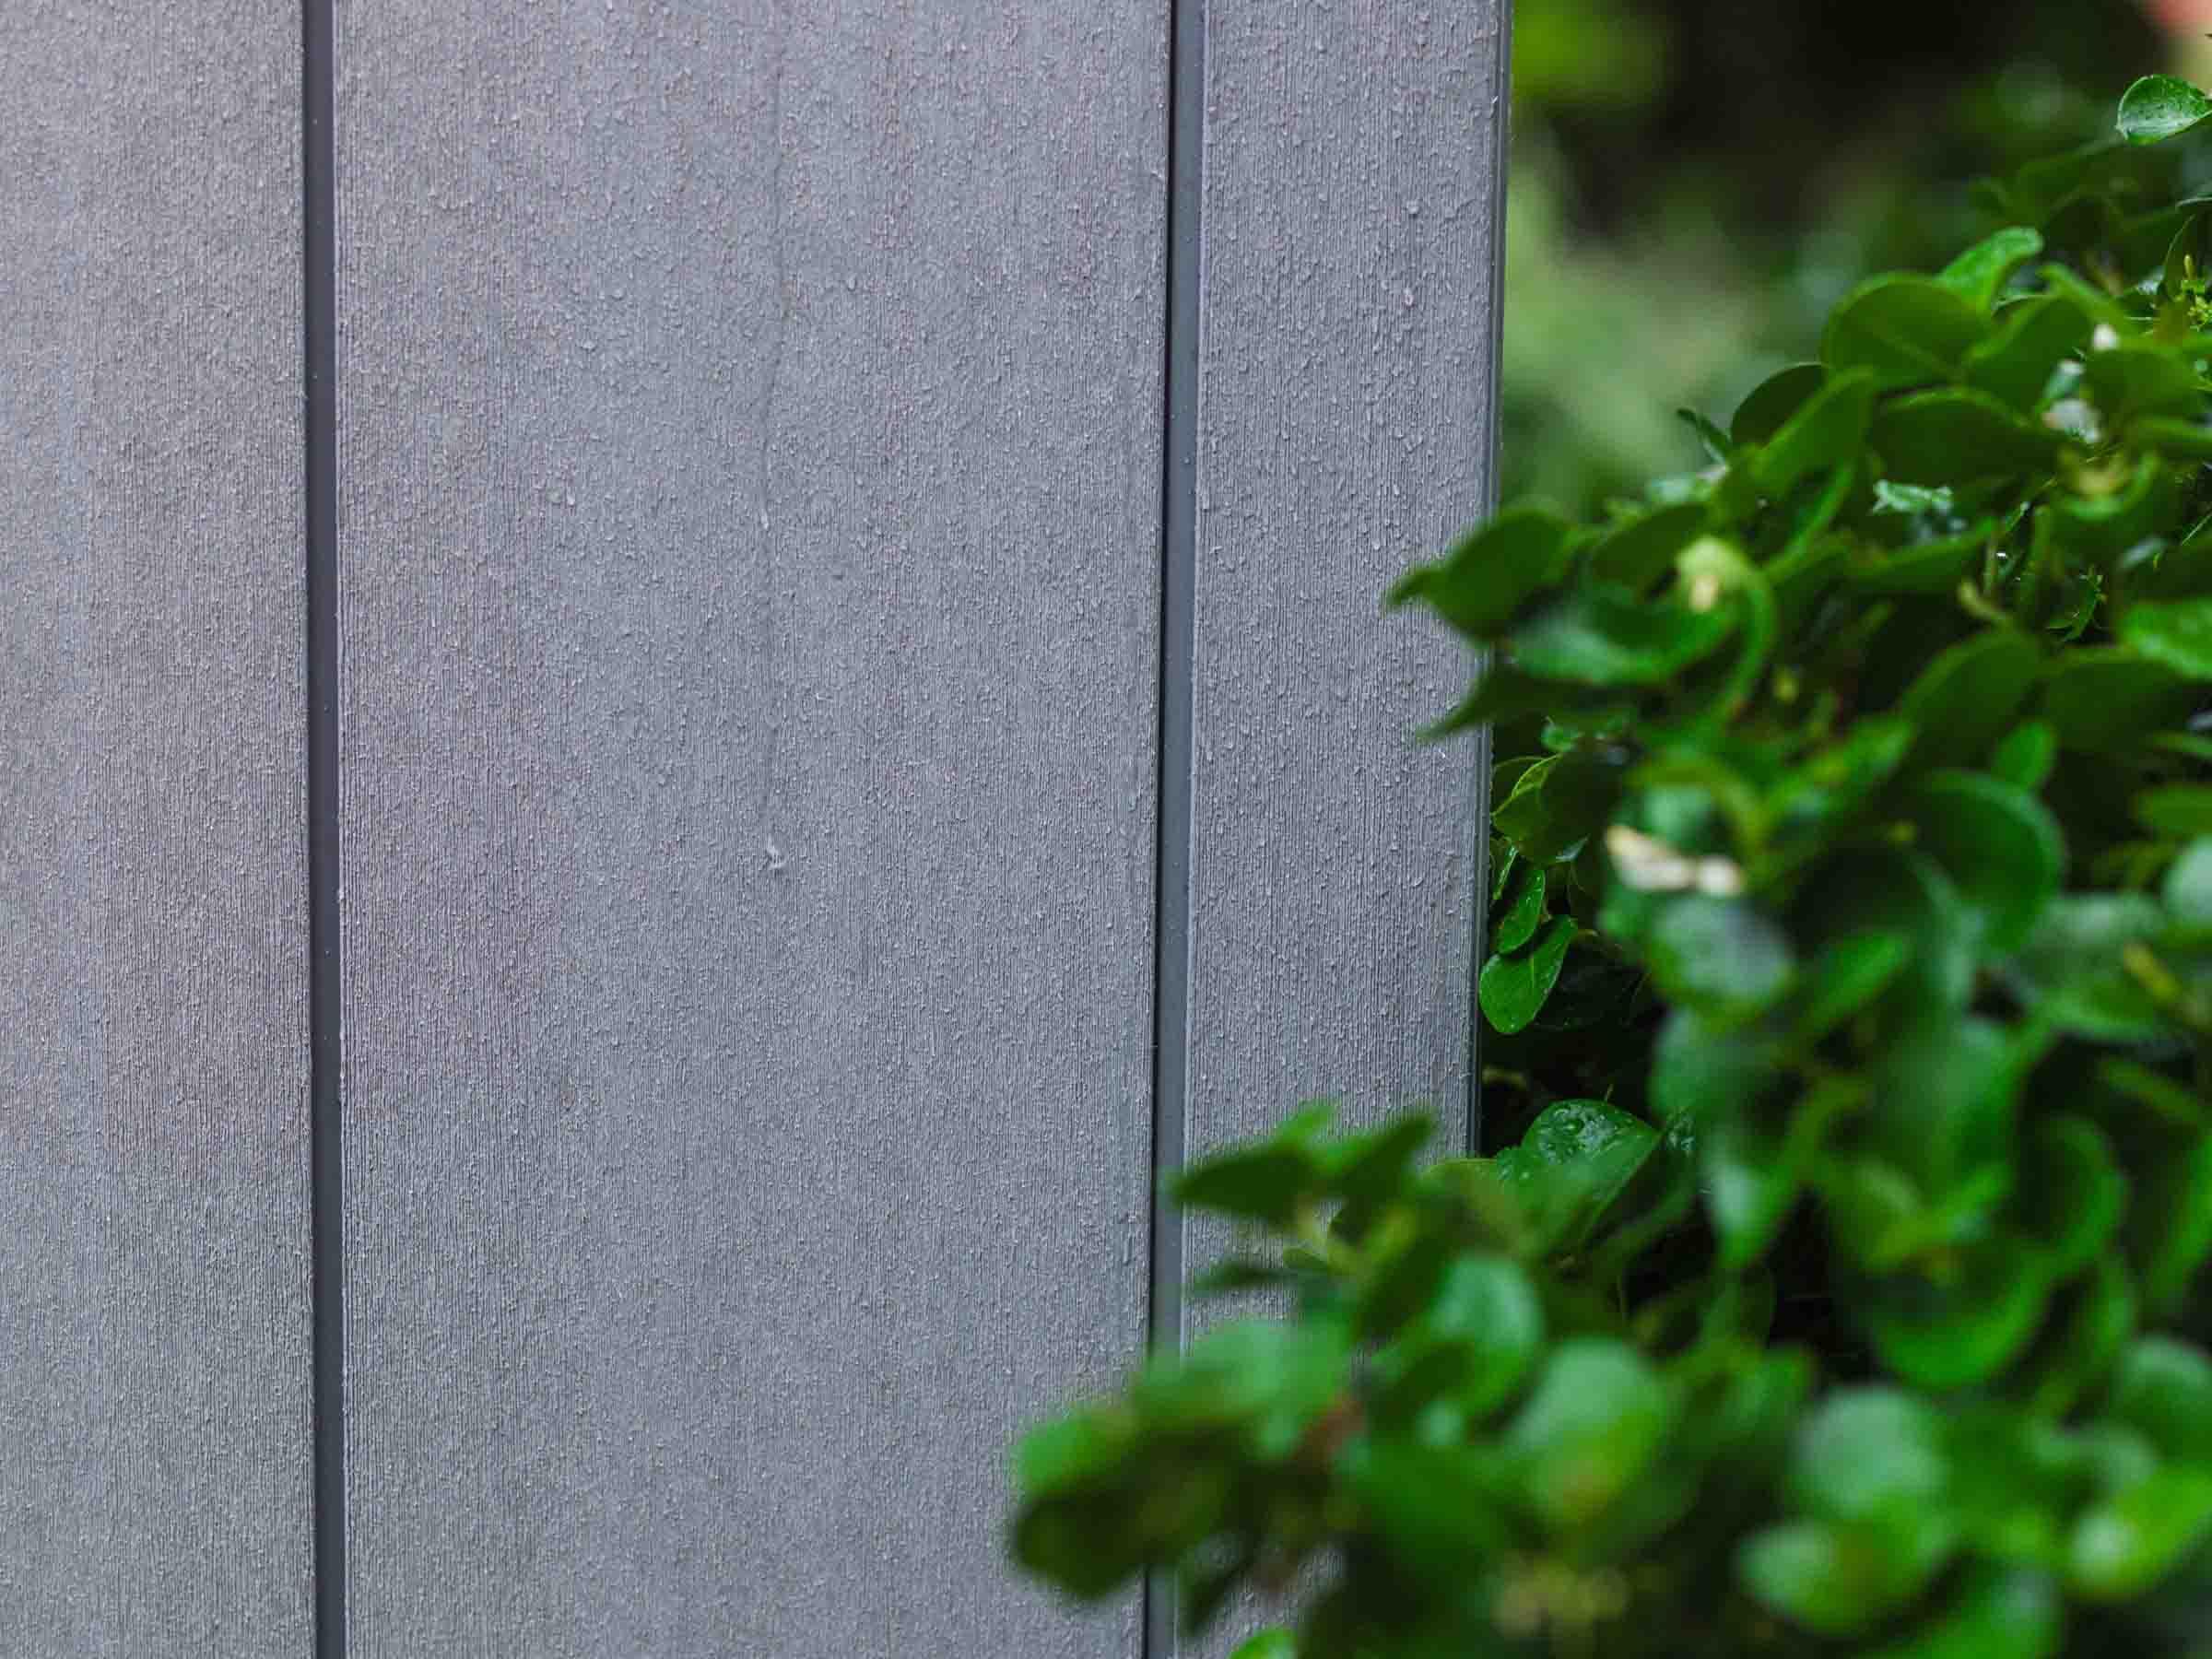 Chalet Jardin : Abri Jardin Résine Brossium® Monopente 117 intérieur Abri Jardin Monopente